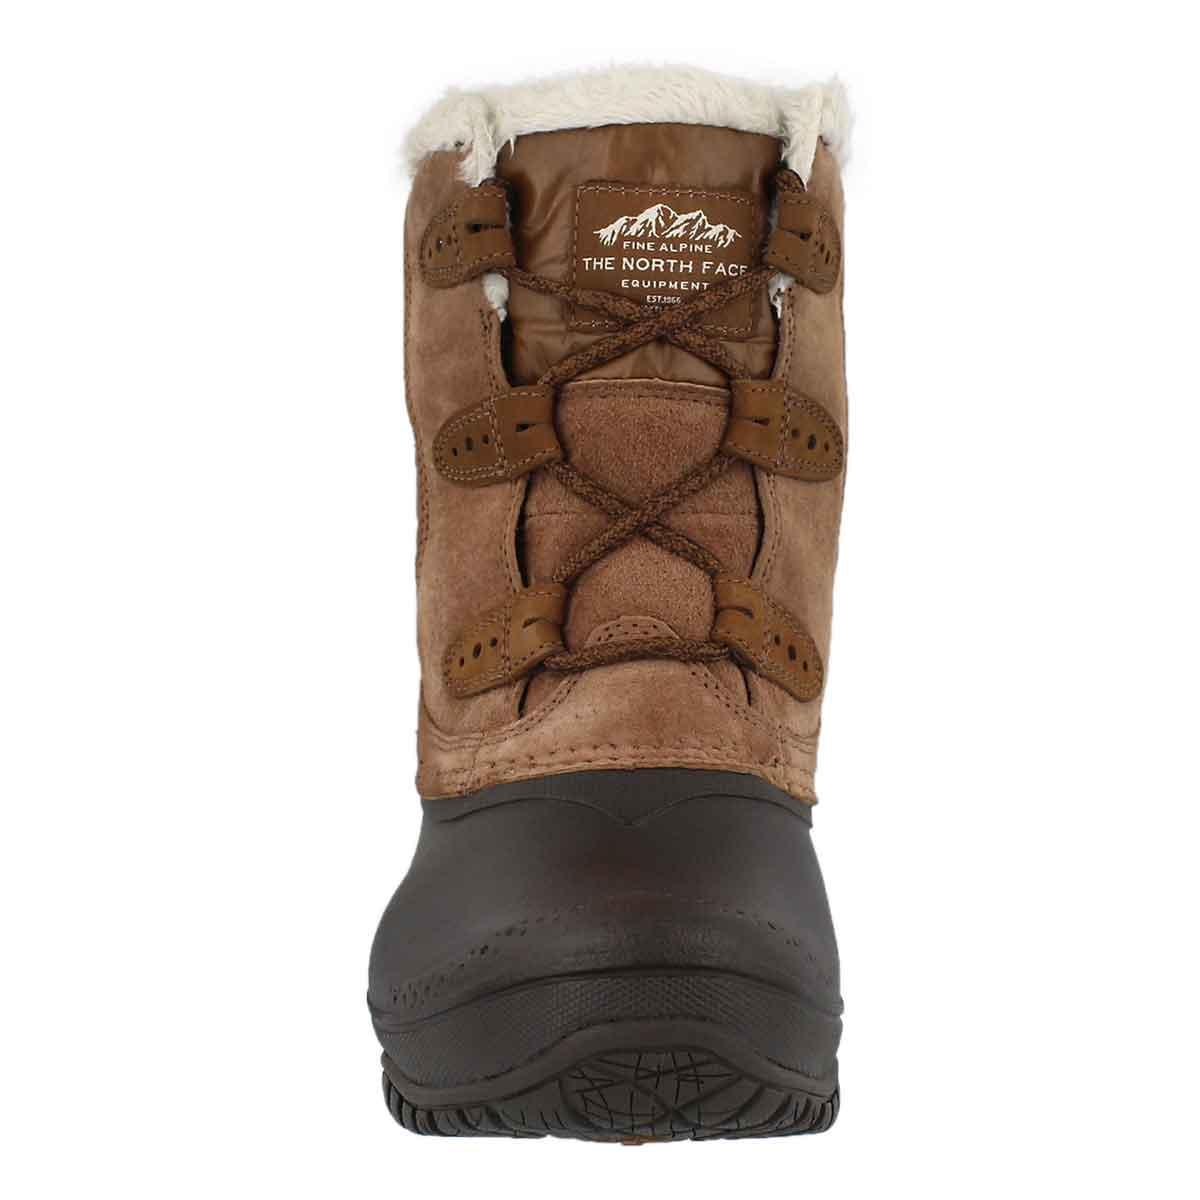 Lds Shellista II Shorty brown wntr boot